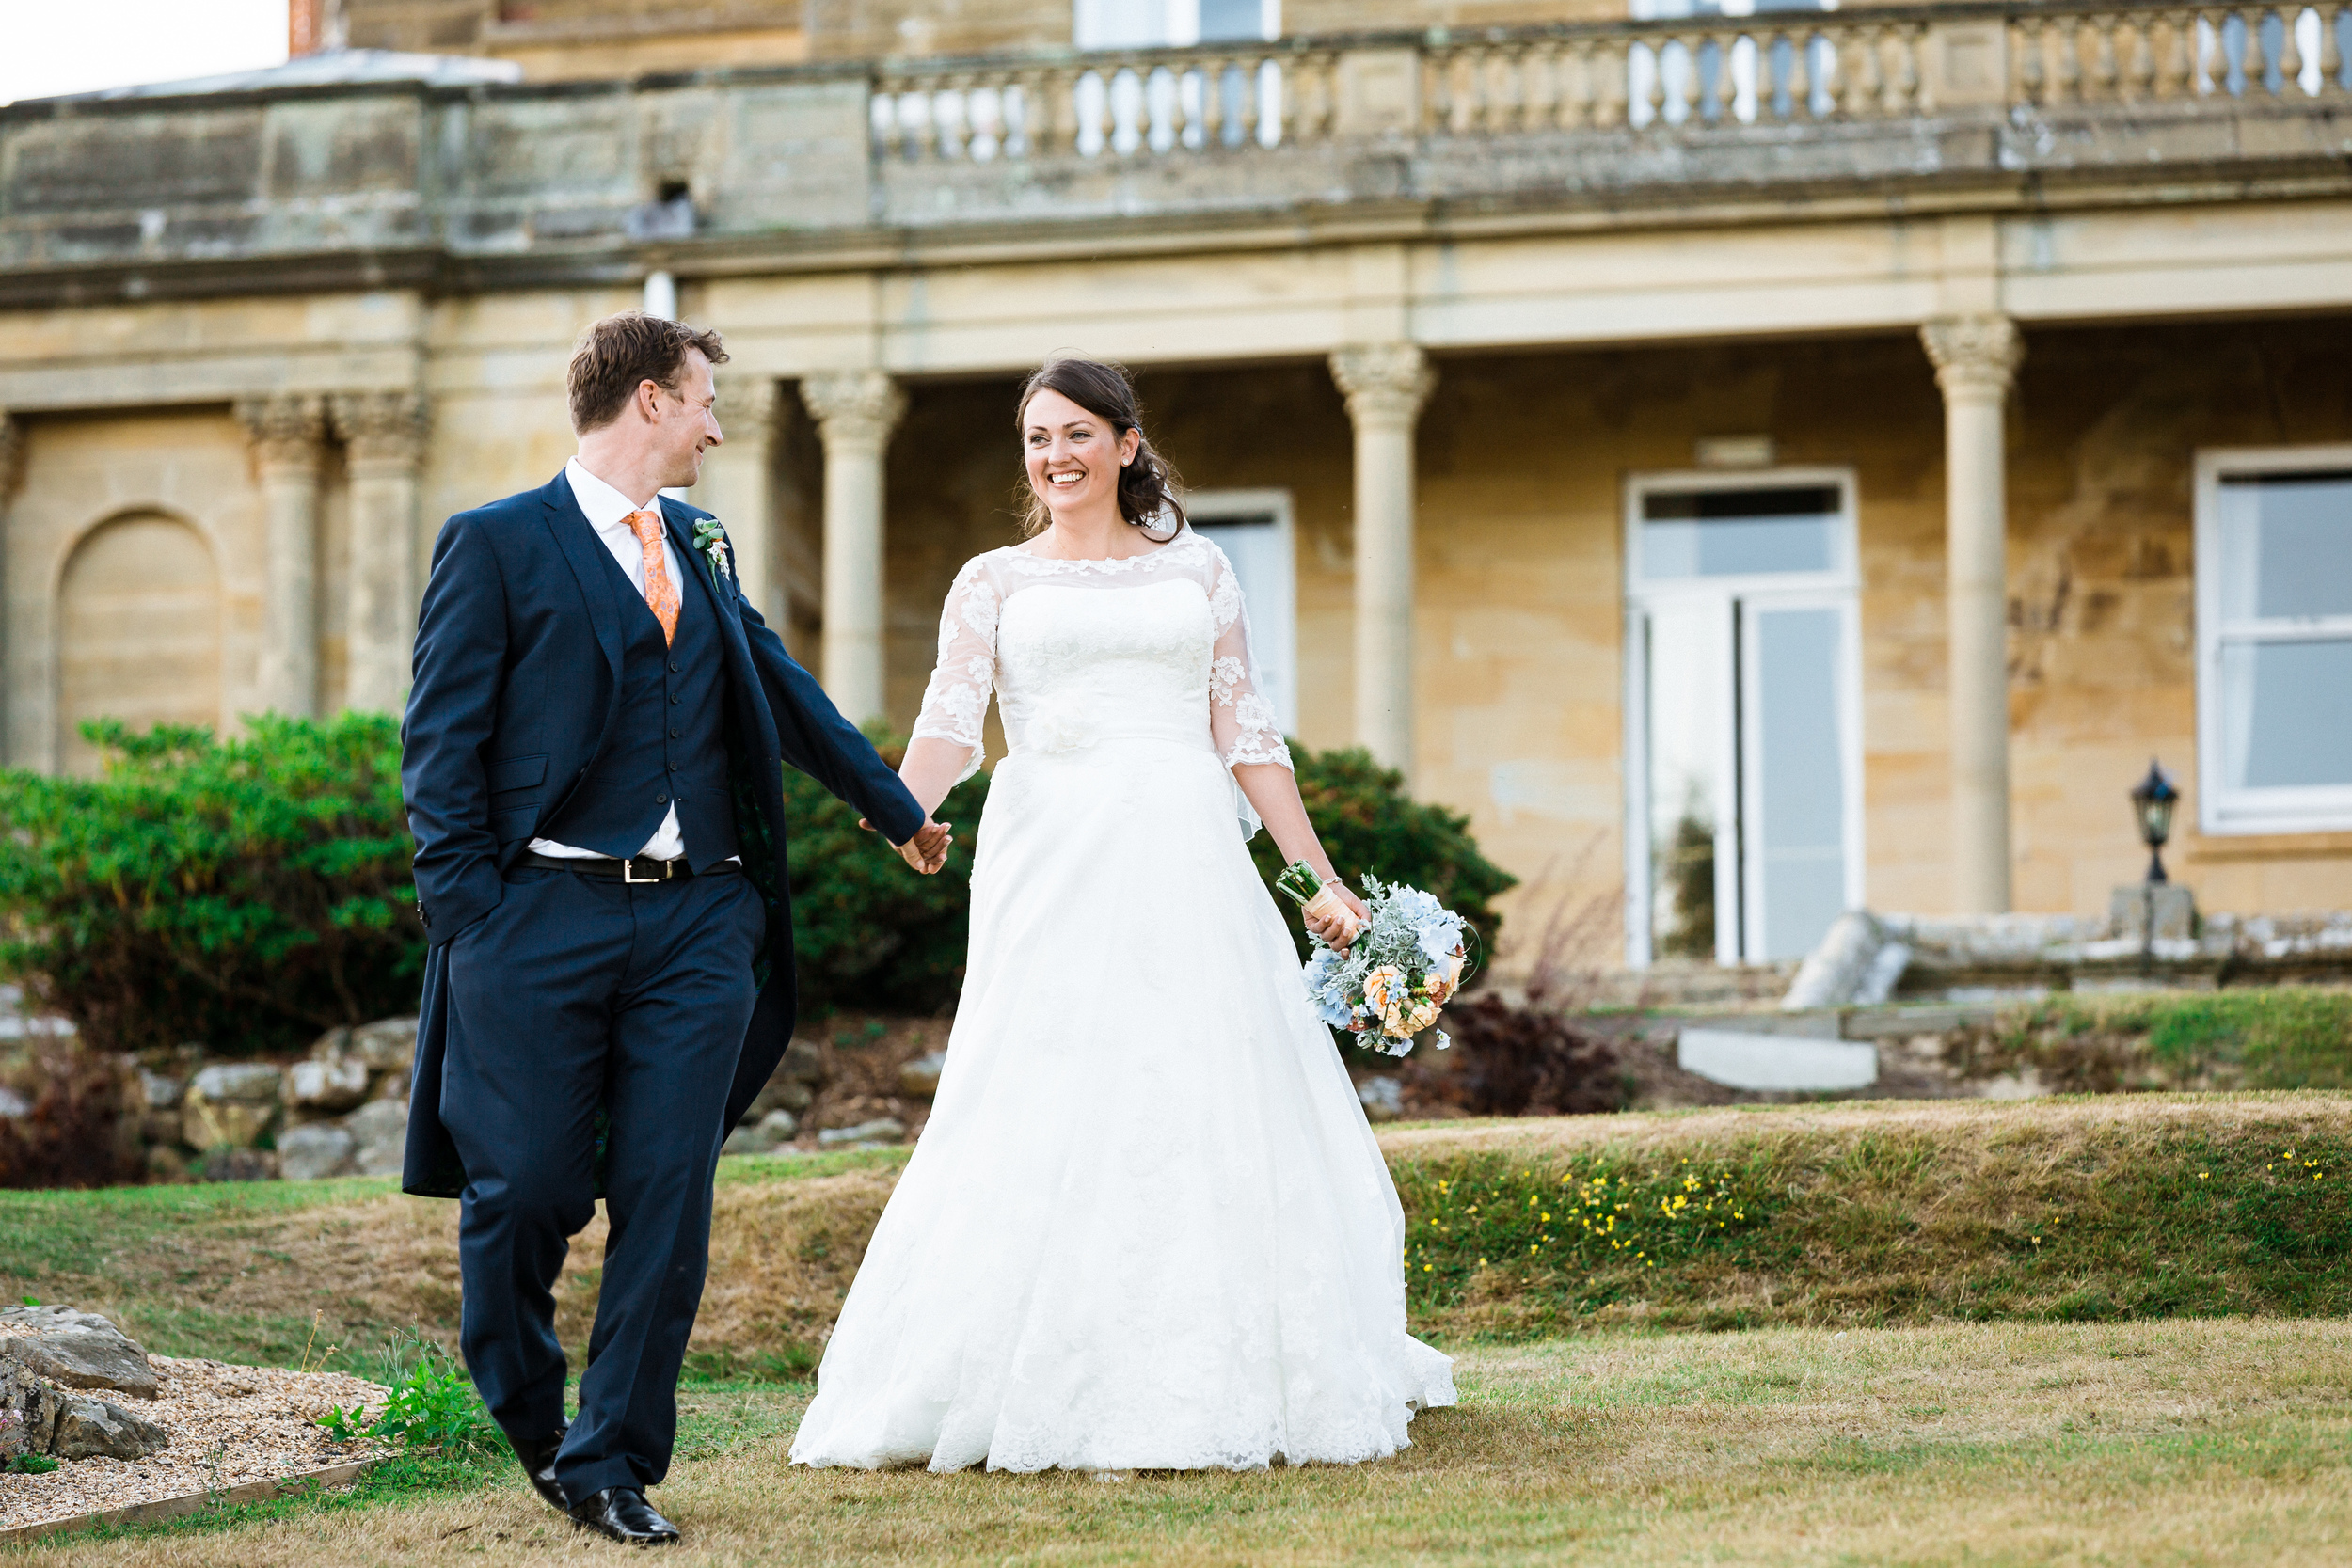 salomons estate tunbridge wells in kent, wedding photographer